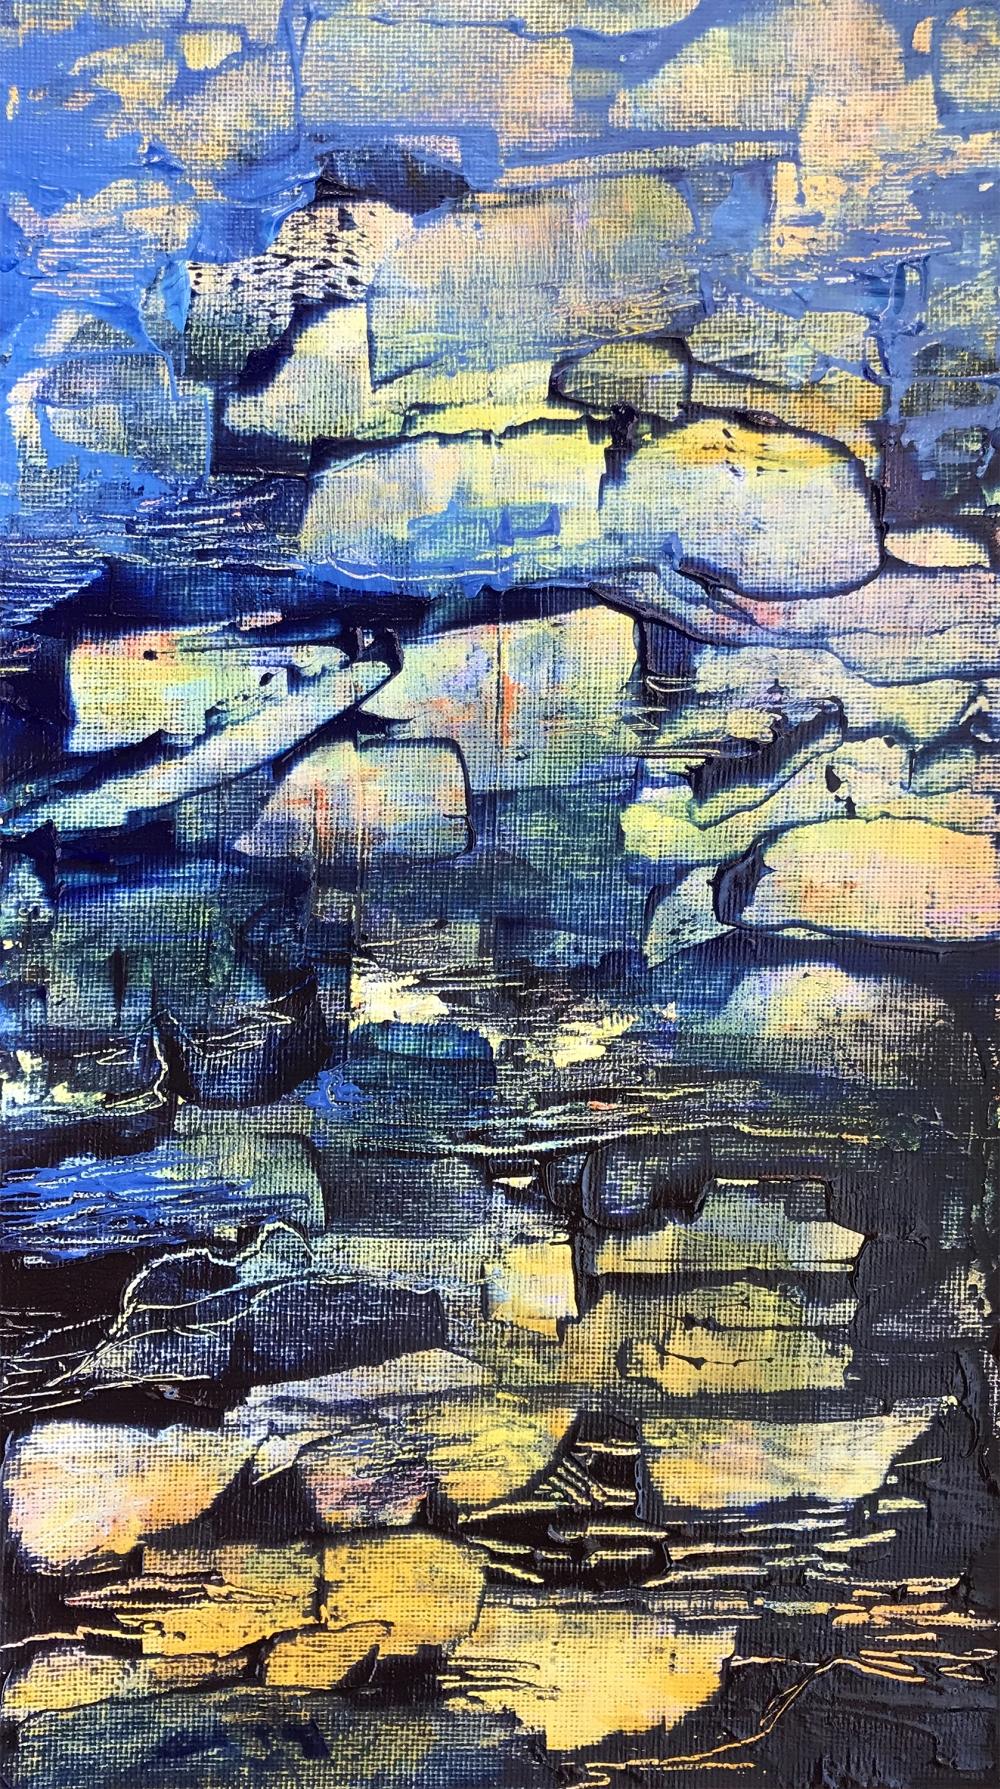 Land Formations Series (Riverbed) - Erin Schalk